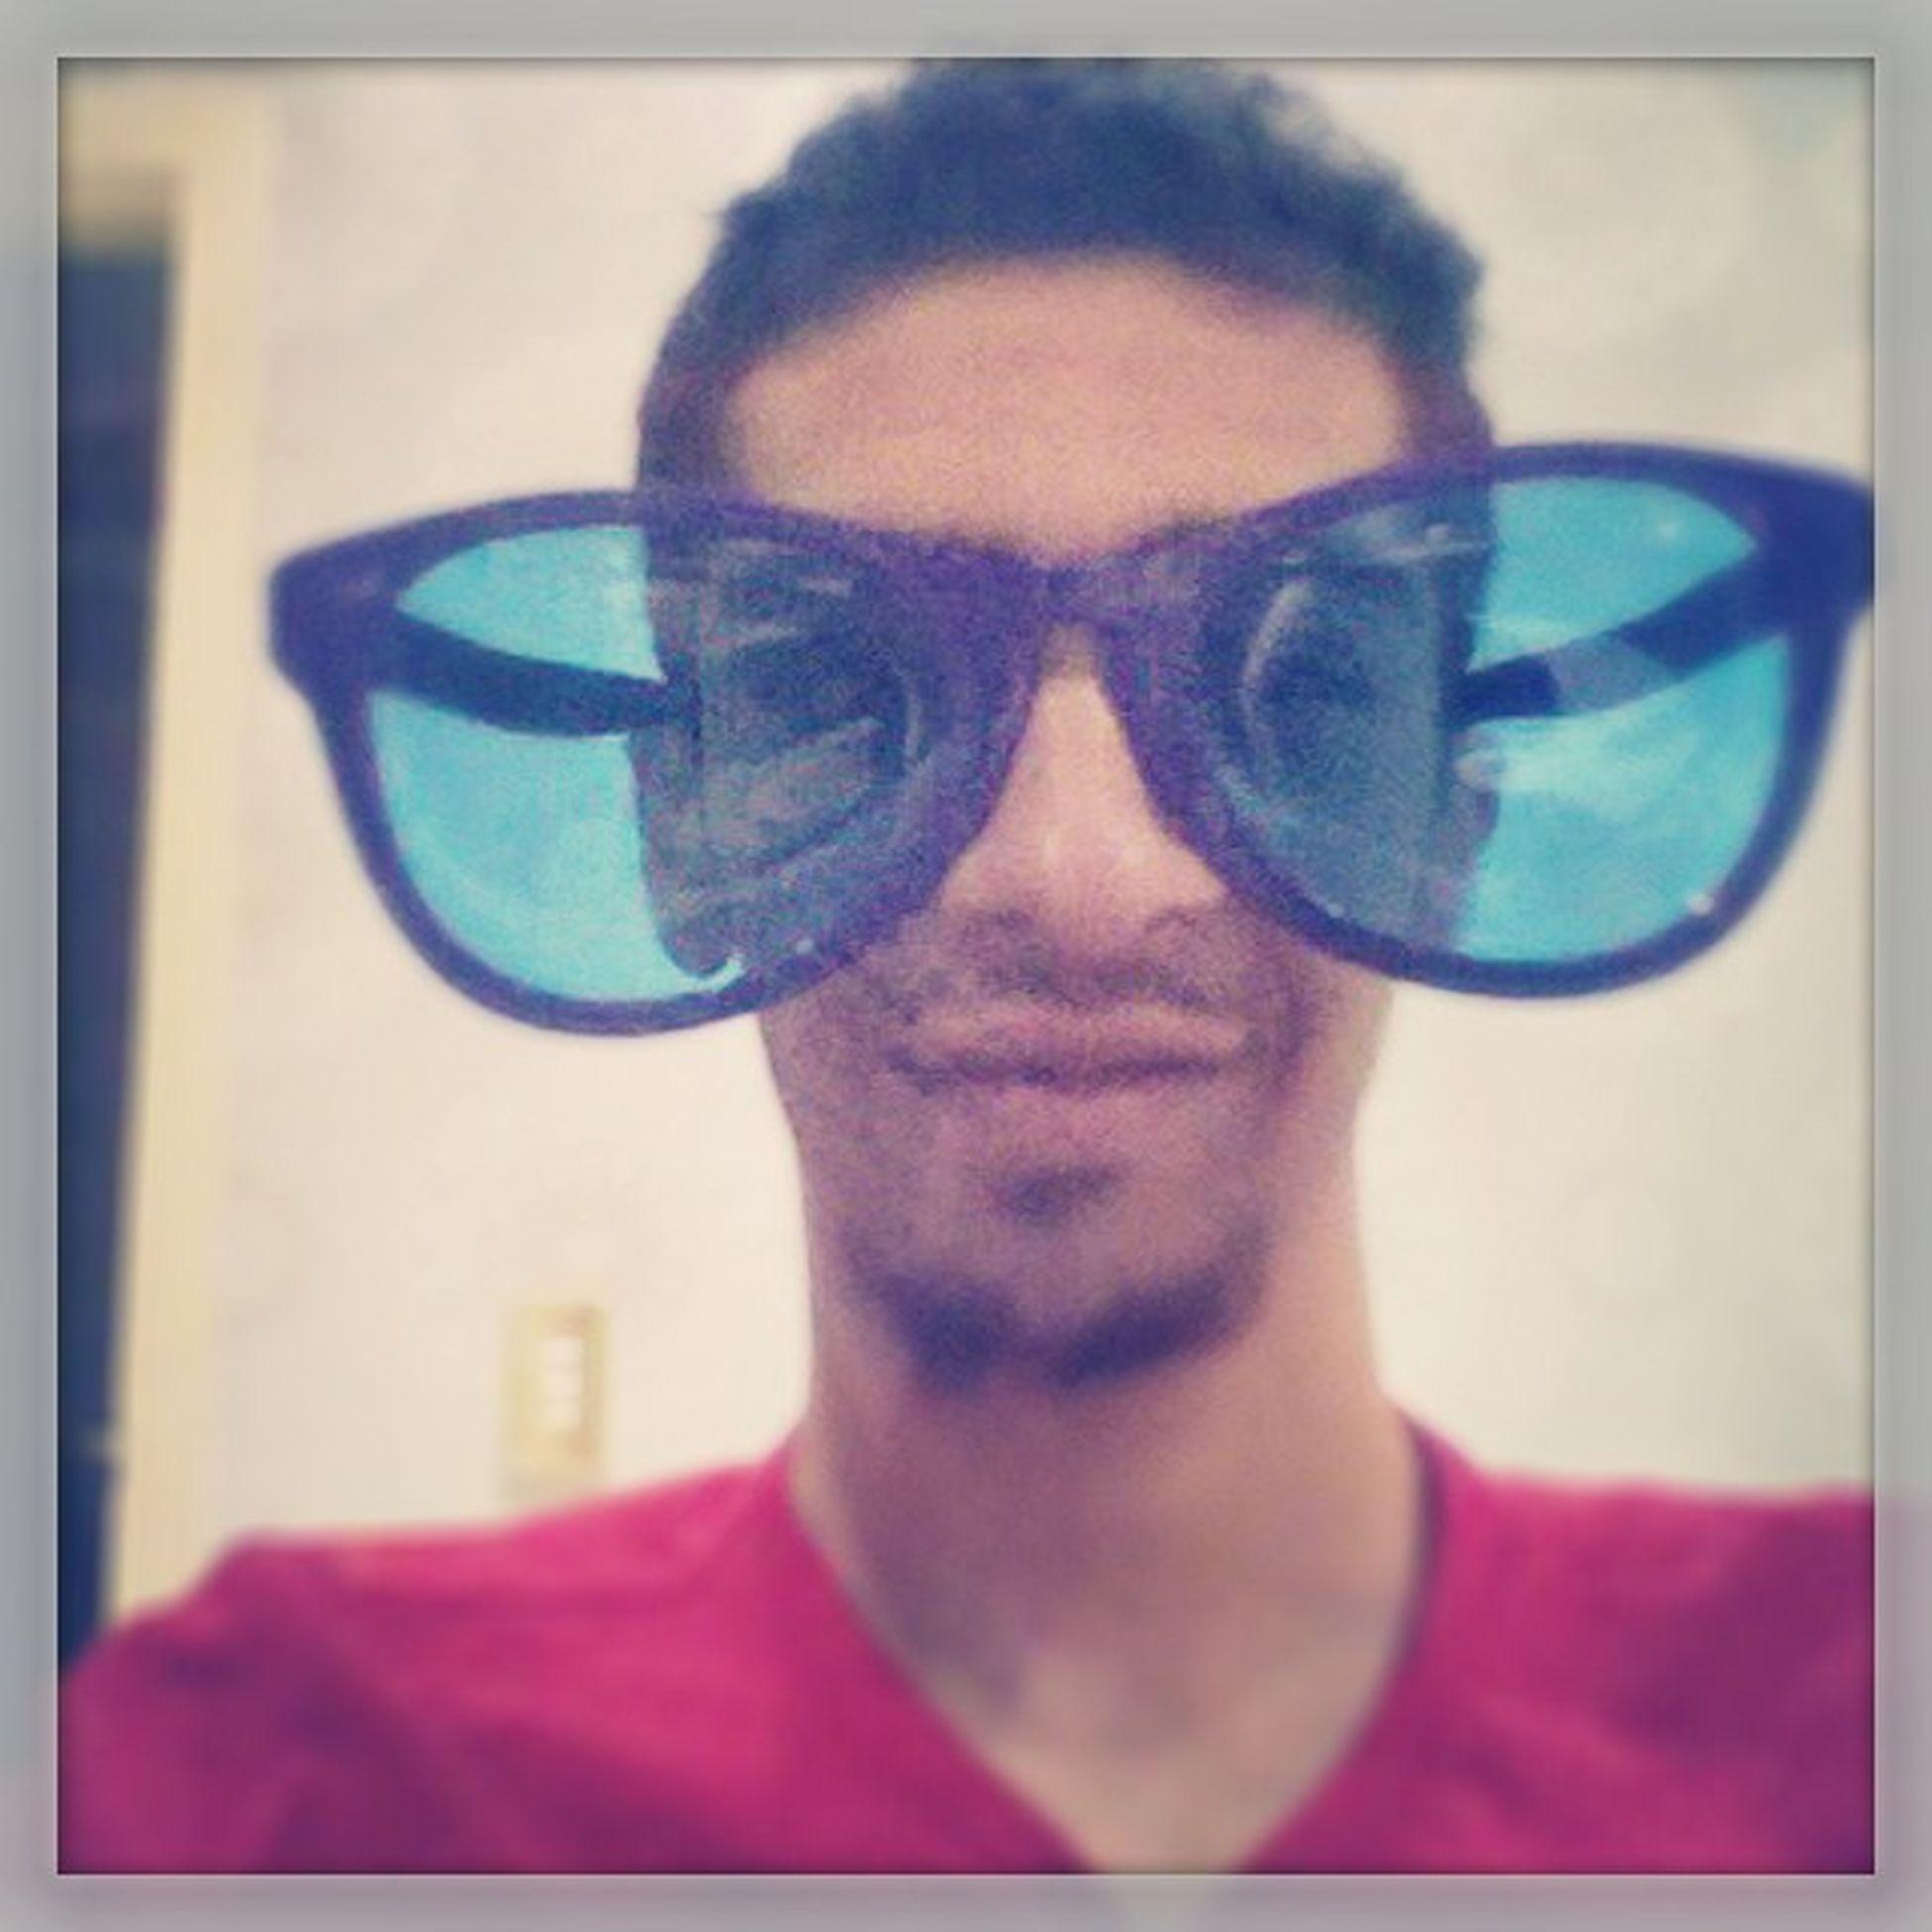 When life seems boring wear big glasses Giantglasses Blueglasses LOL Unbreakable